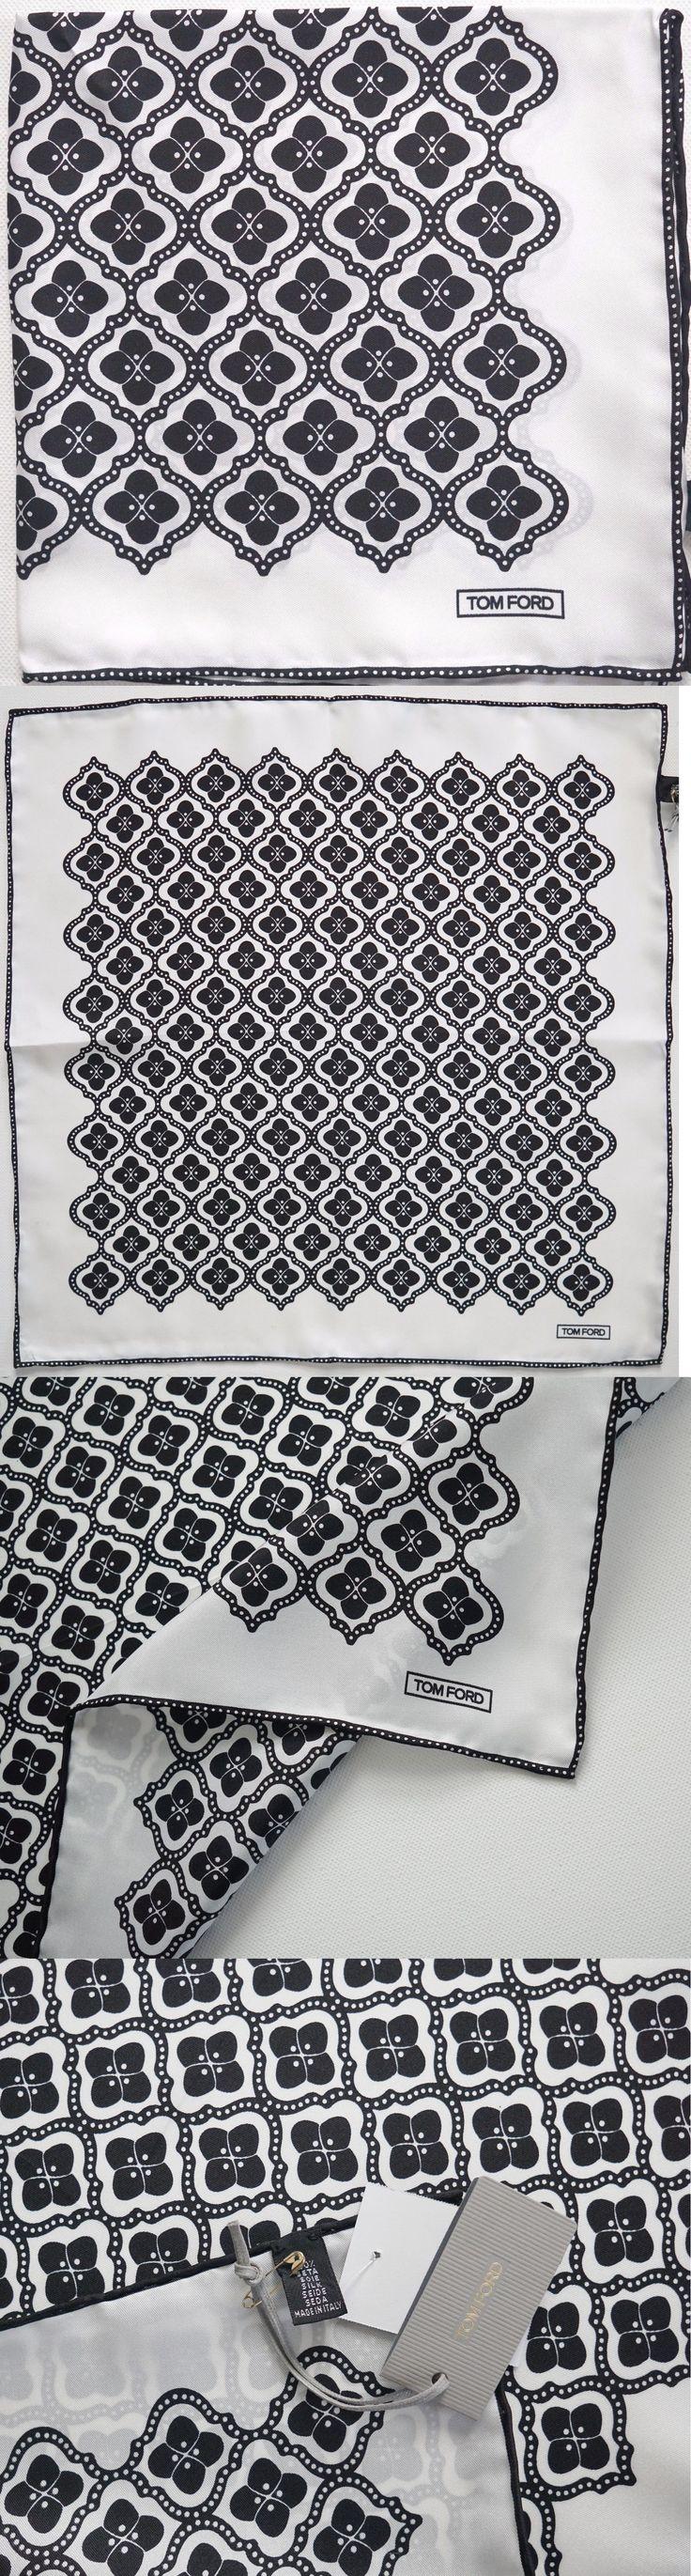 Handkerchiefs 167902: $165 Nwt Authentic Tom Ford 100% Silk Pocket Square Pochette Handkerchief -> BUY IT NOW ONLY: $65 on eBay!